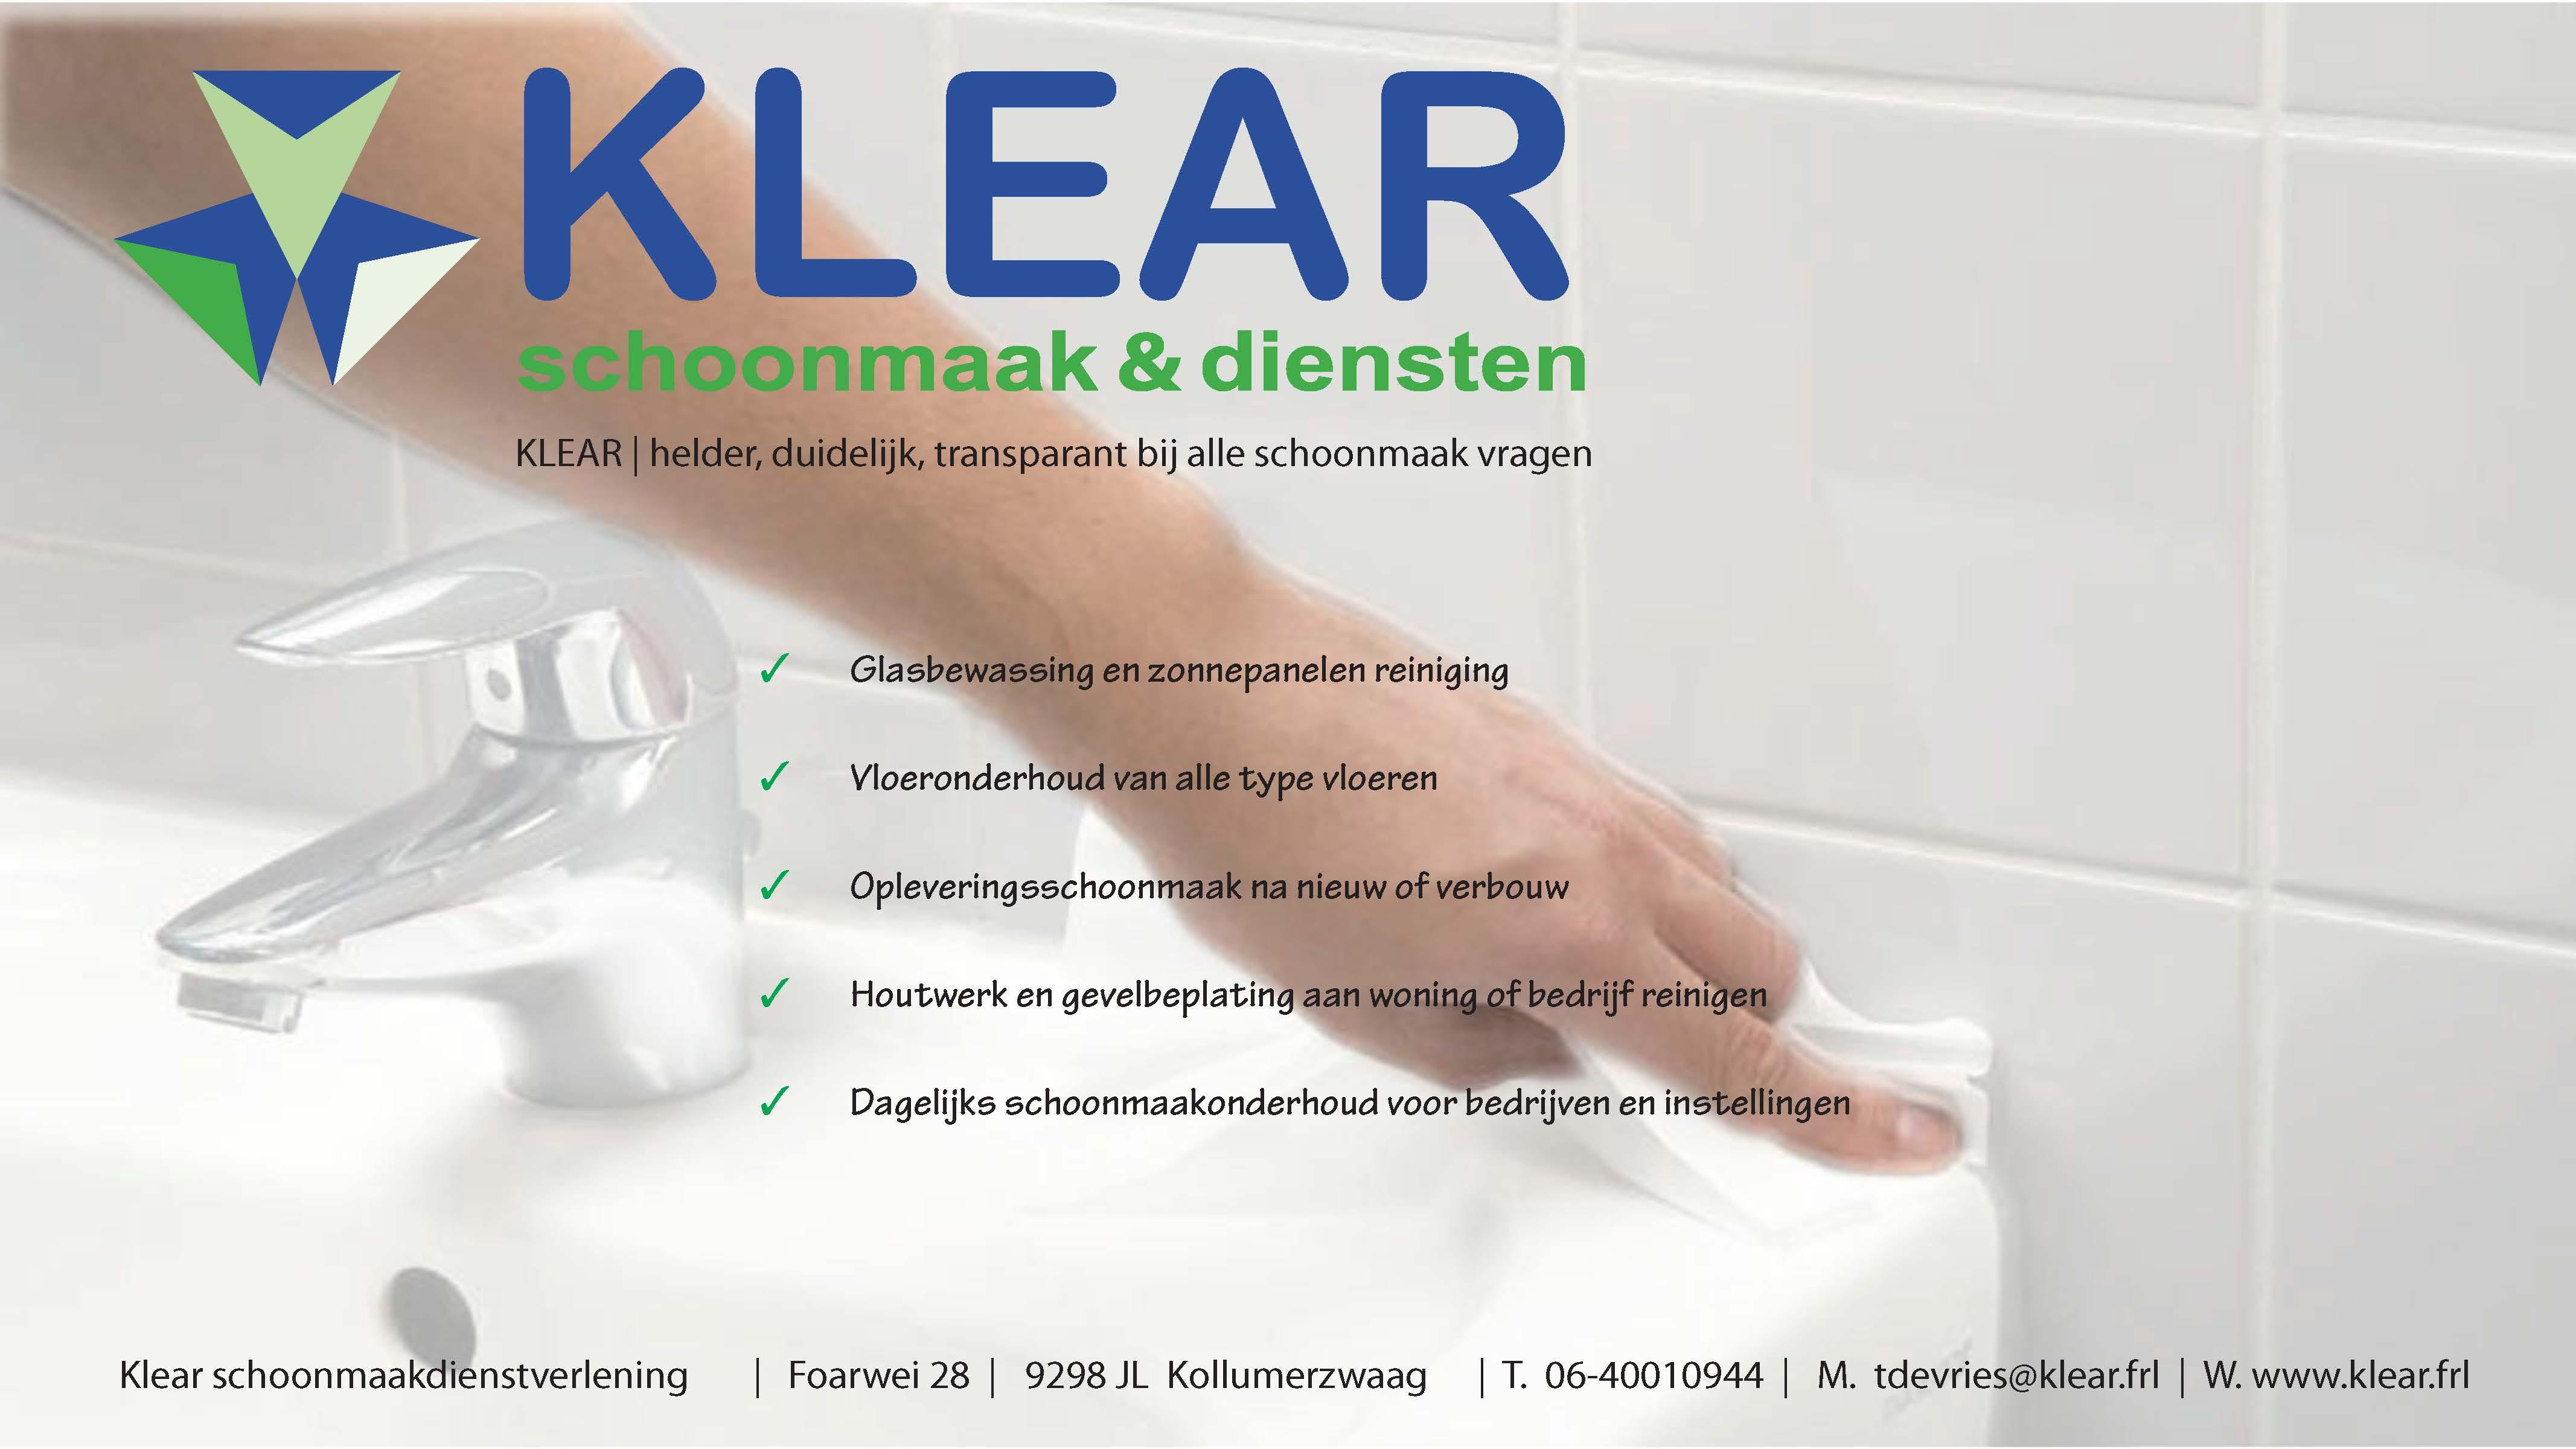 KLEAR – Schoonmaakdienstverlening